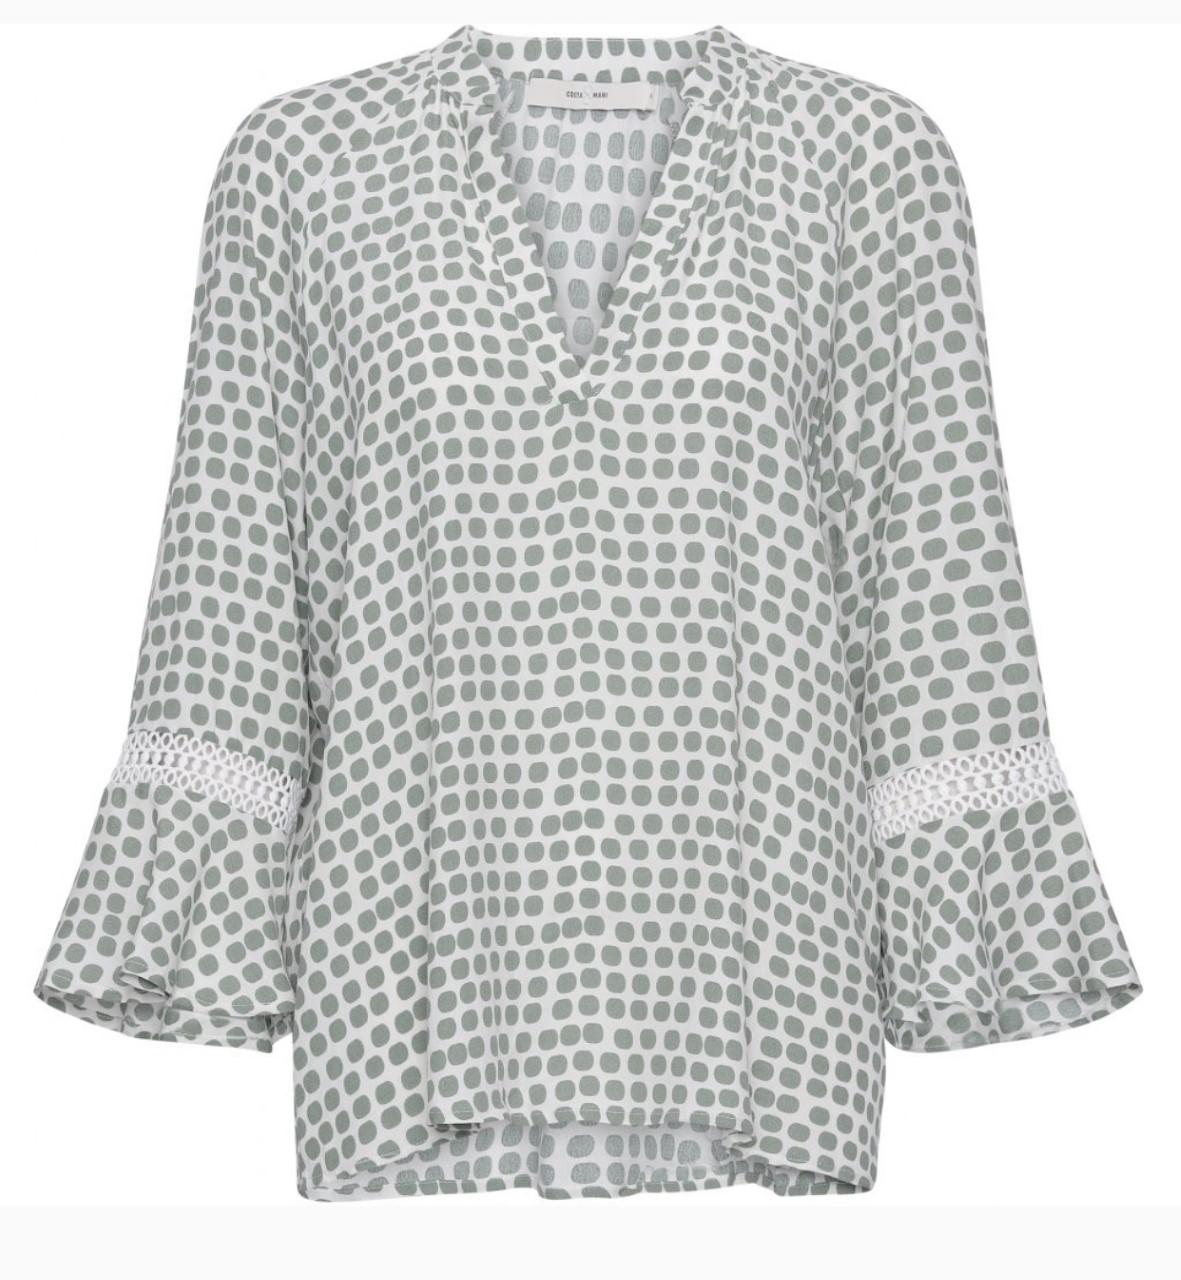 CostaMani Meta shirt bluse